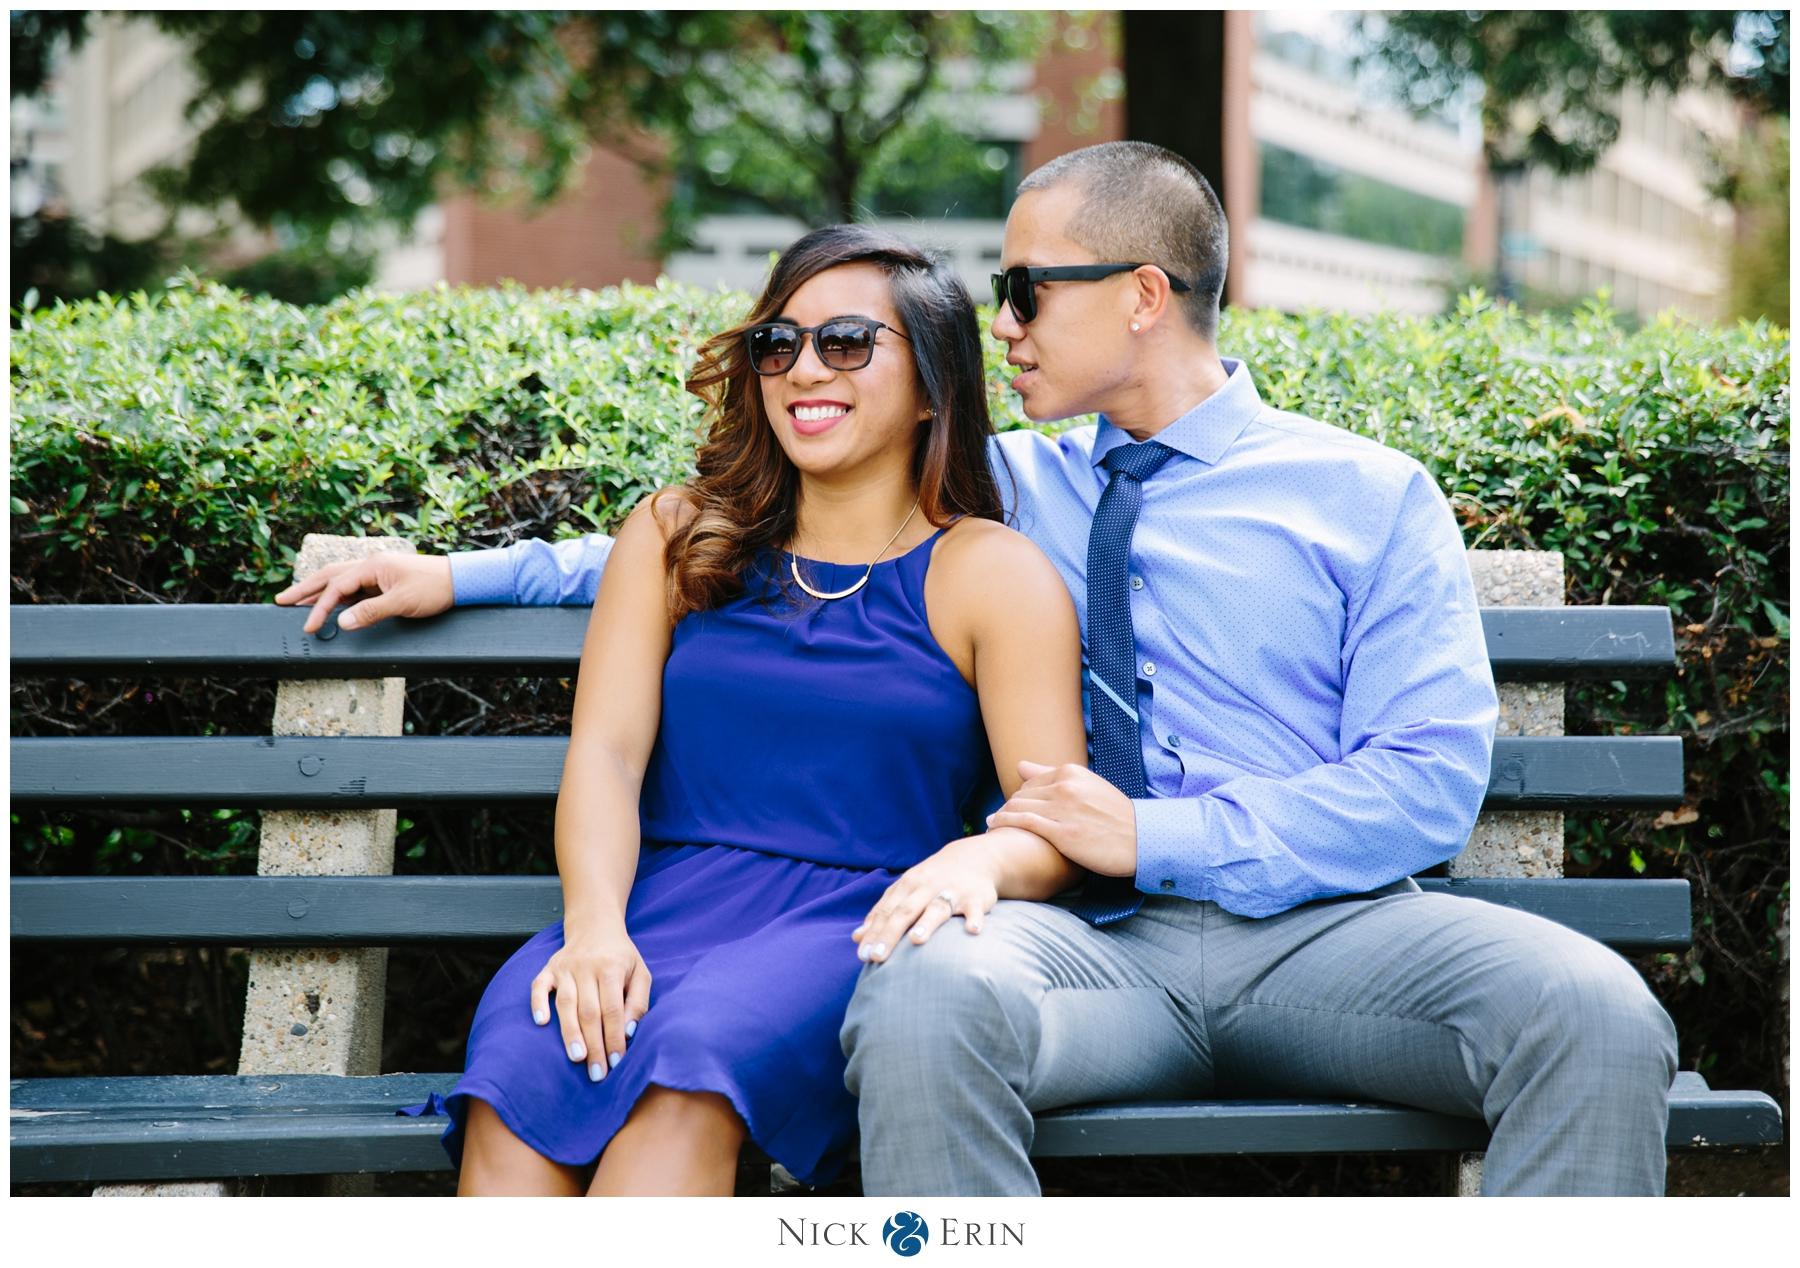 Donner_Photography_Washington DC Engagement Session_Jenny Mae & Vic_0020